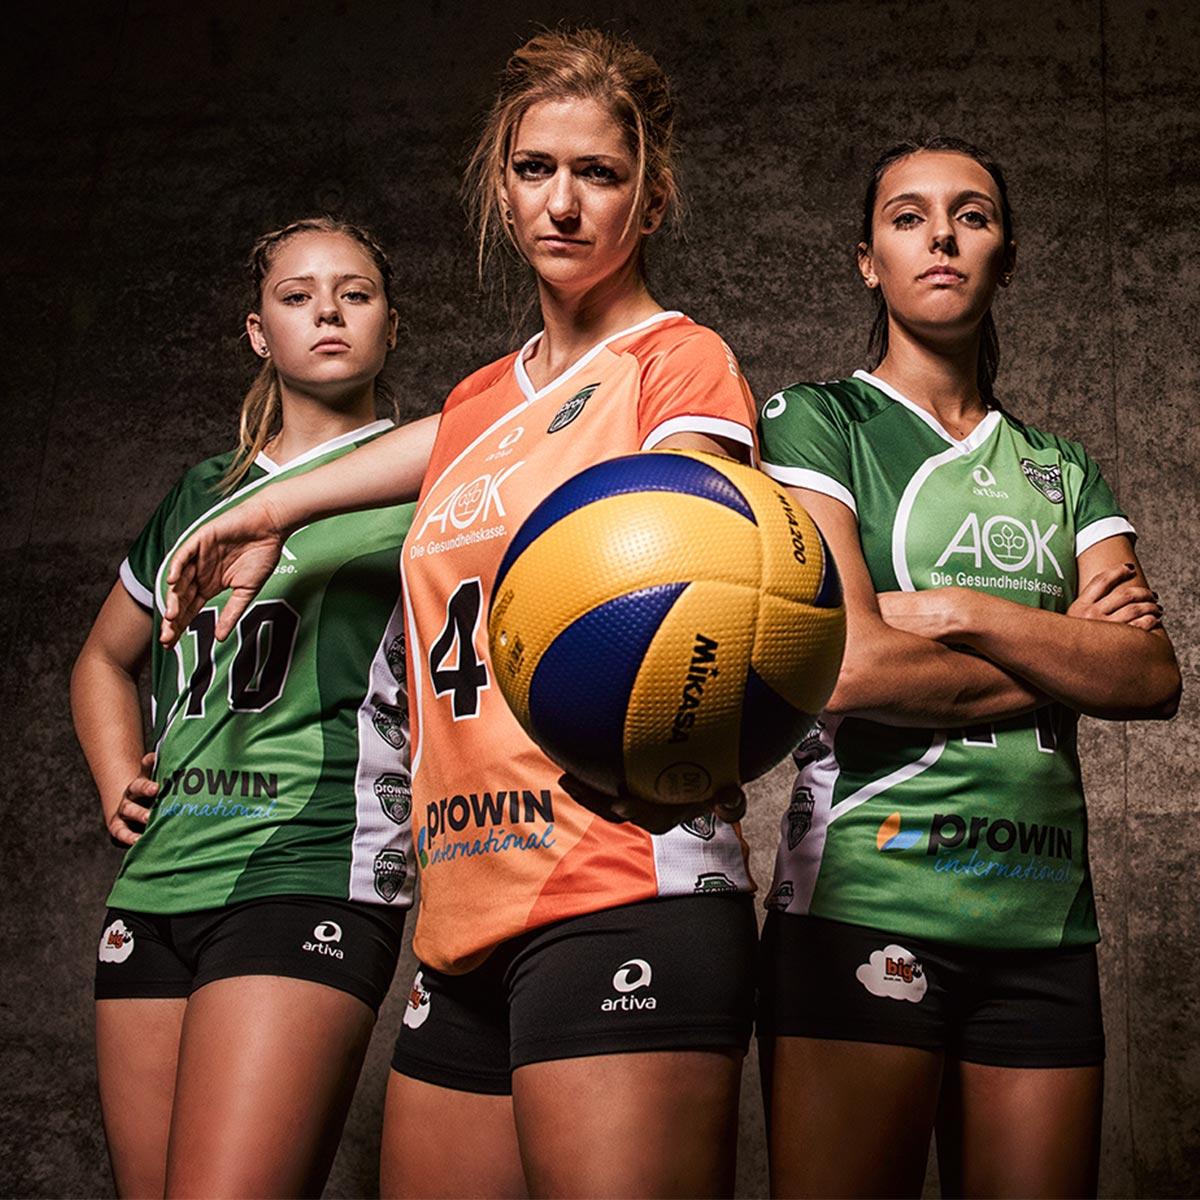 Artiva Trikots Customized Individuelle Volleyball 100 Gestalten gqY7Zn0xw